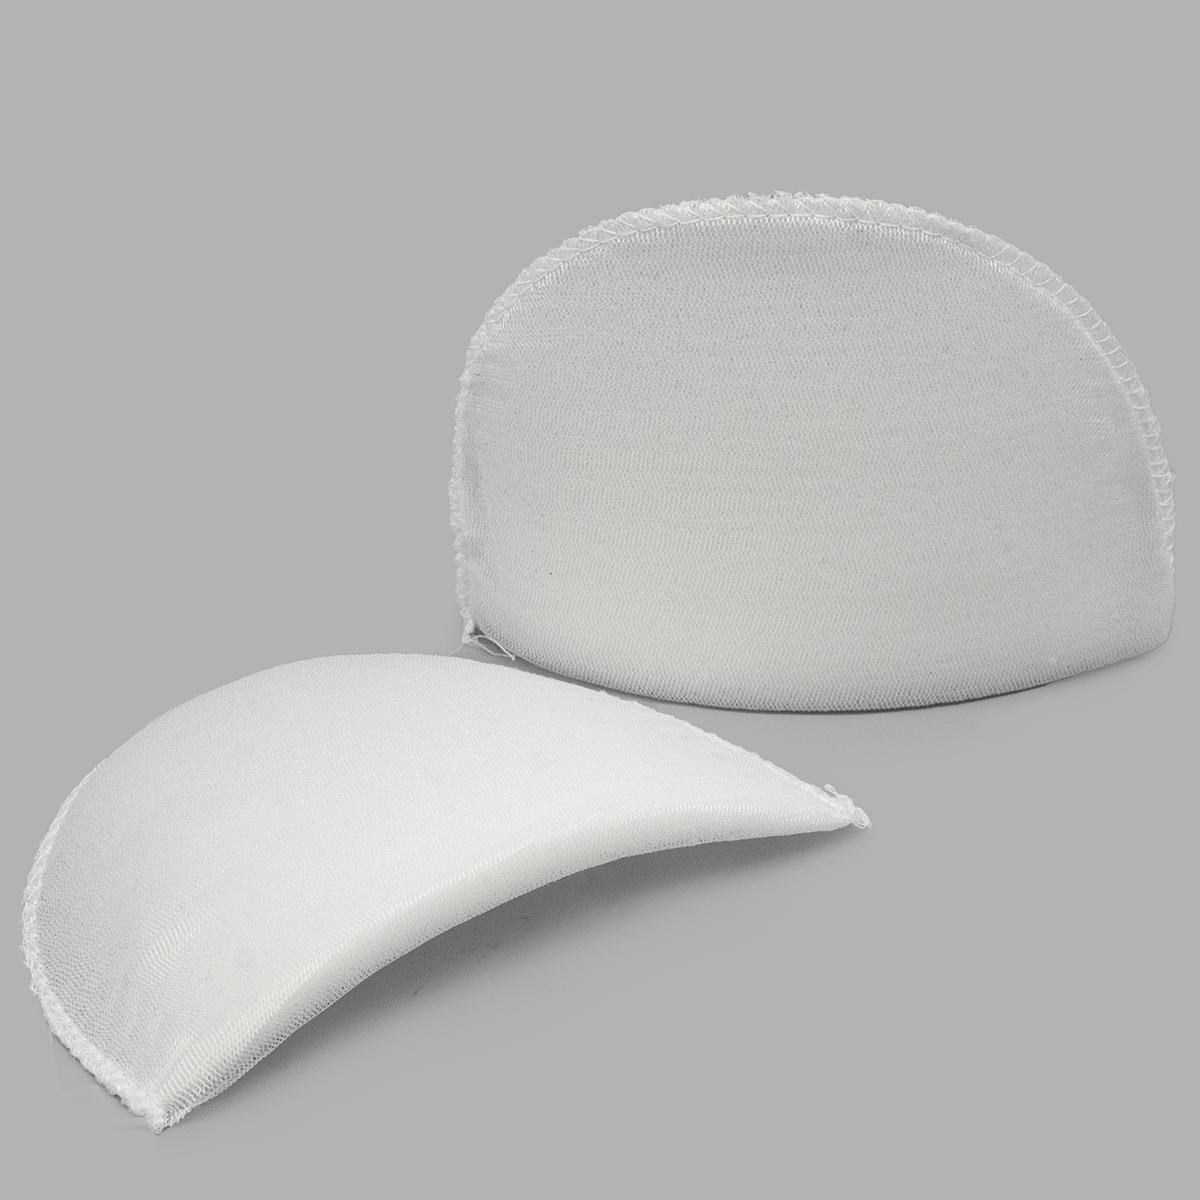 В-10/А Плечевые накладки обшитые, втачные, белый, 10*100*145 мм, Hobby&Pro